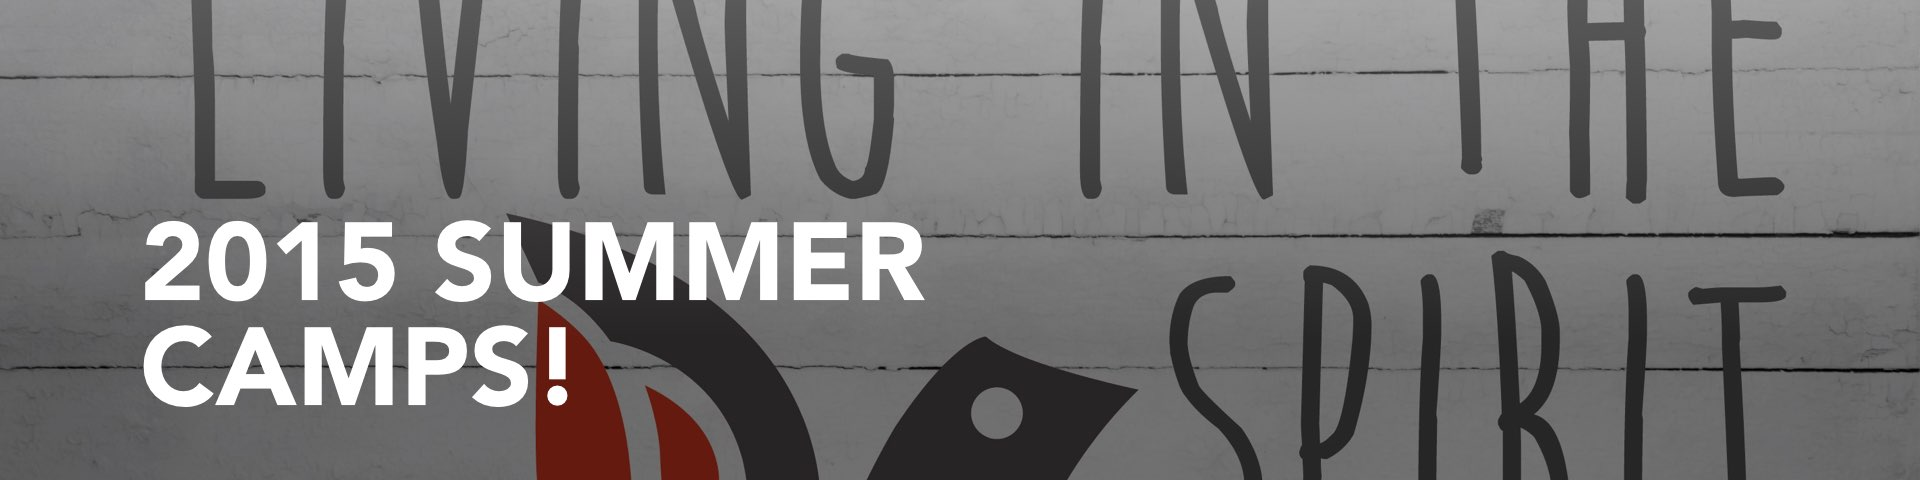 2015-summer-camps-bar